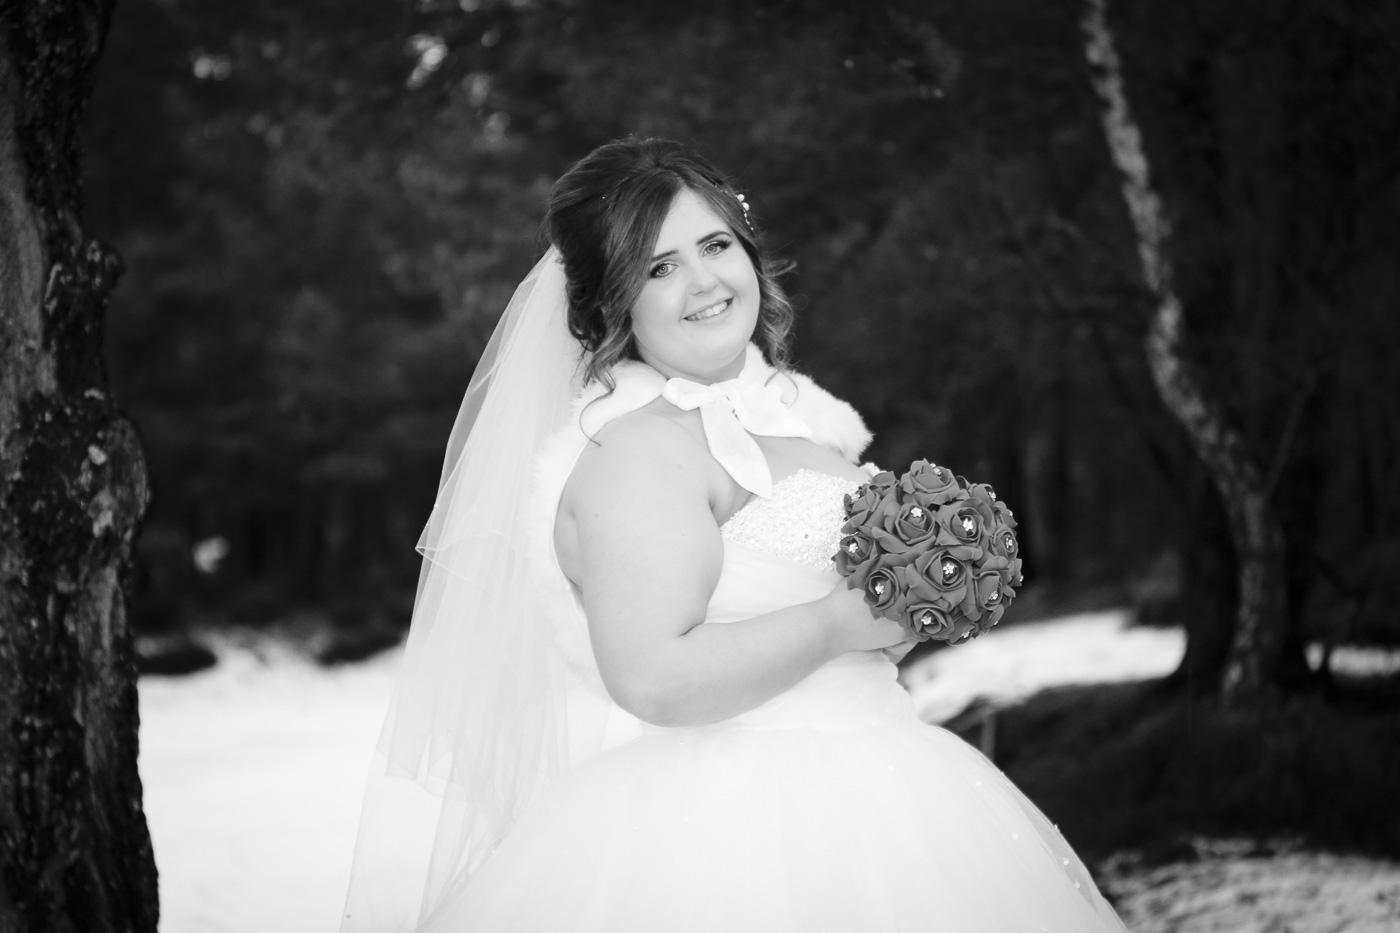 wedding-photography-at-the-hilton-coylumbridge-aviemore-8032-2